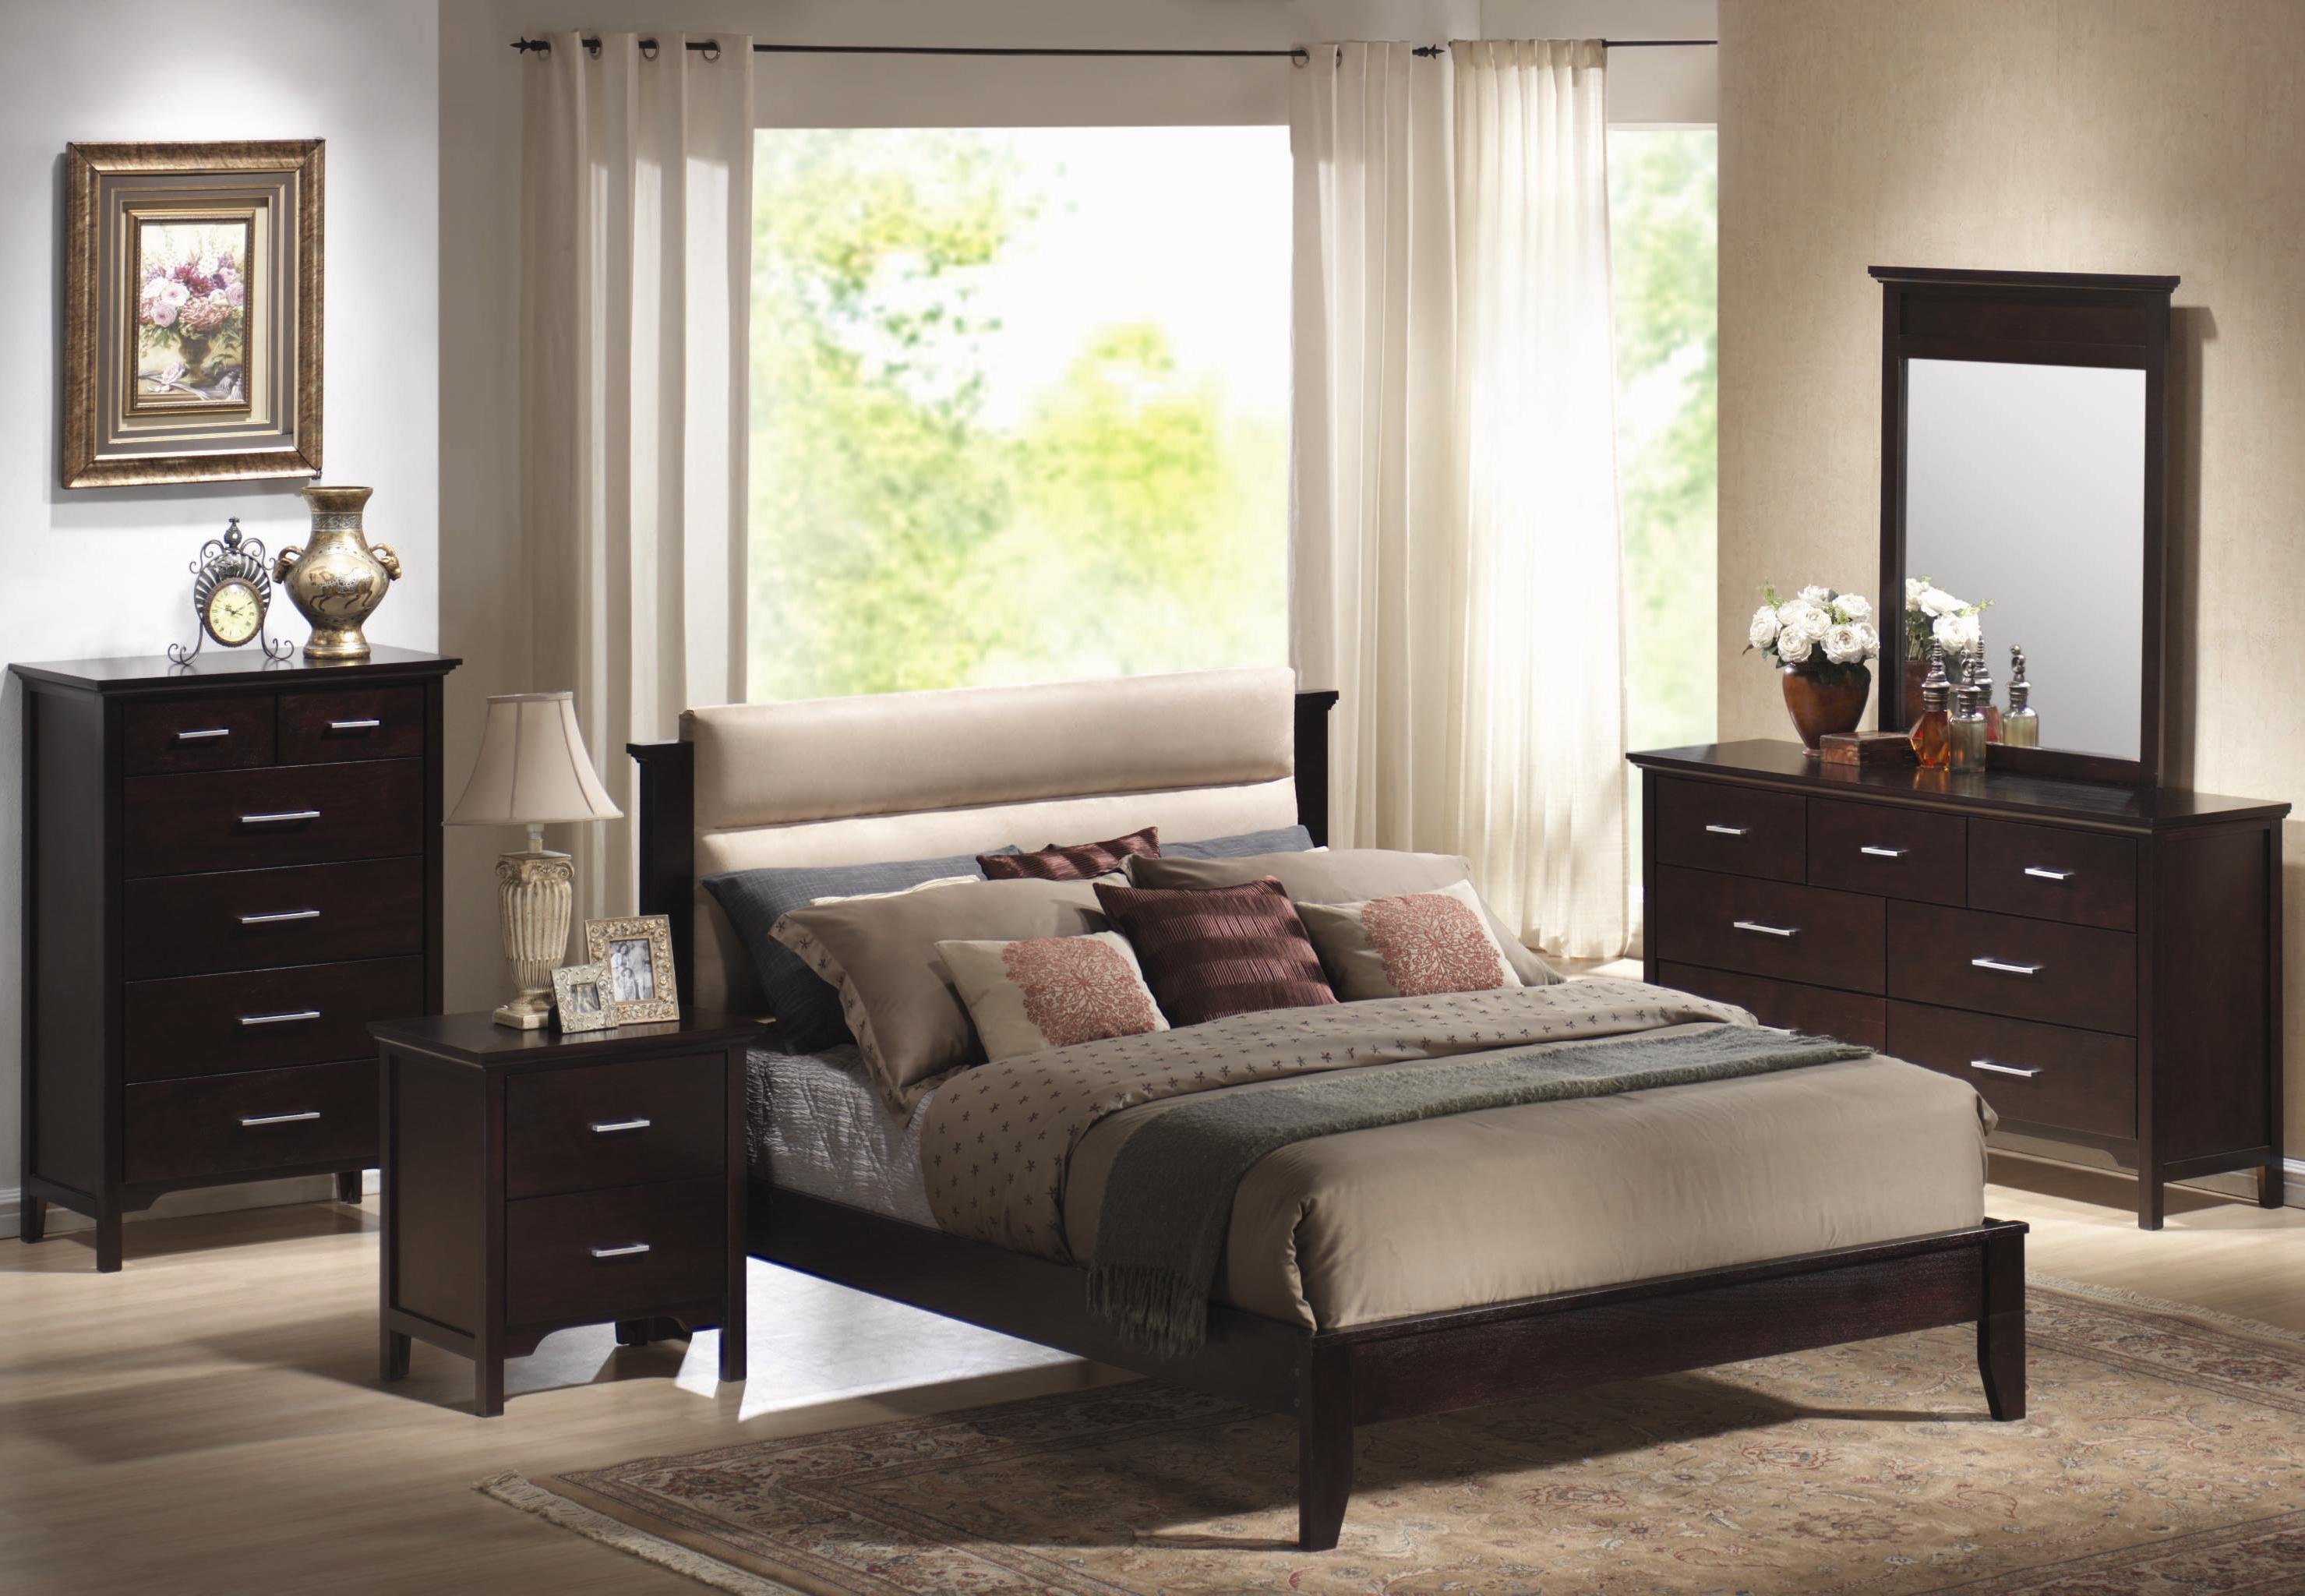 bdcoa3 3pc bedroom set reg $3.3 now $3.3 - Pina Furniture